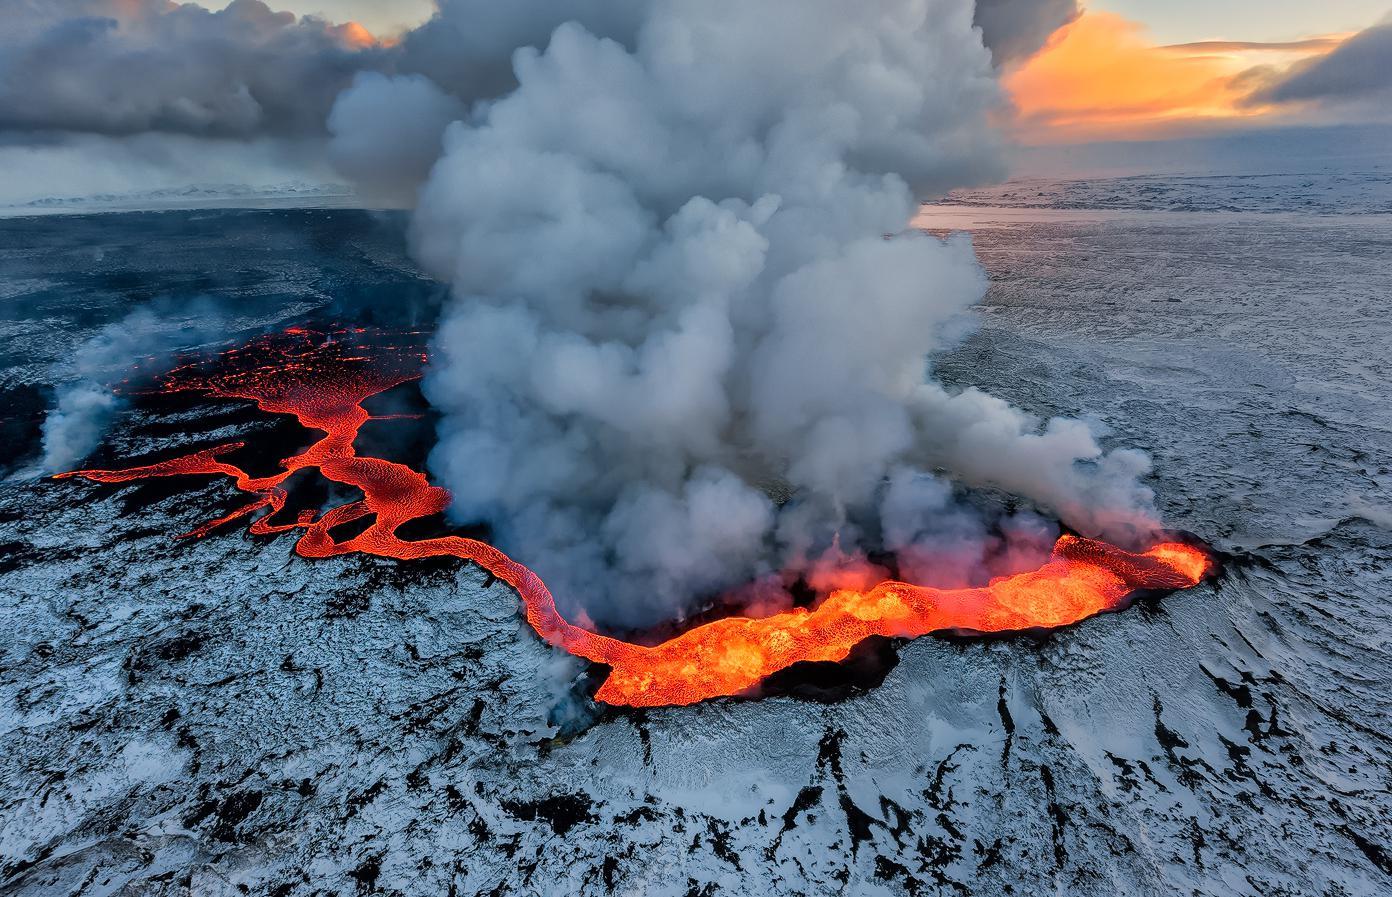 islandia2 Μέρη που αξίζει να επισκεφτείς μέσα στο 2017 (μέρος β')